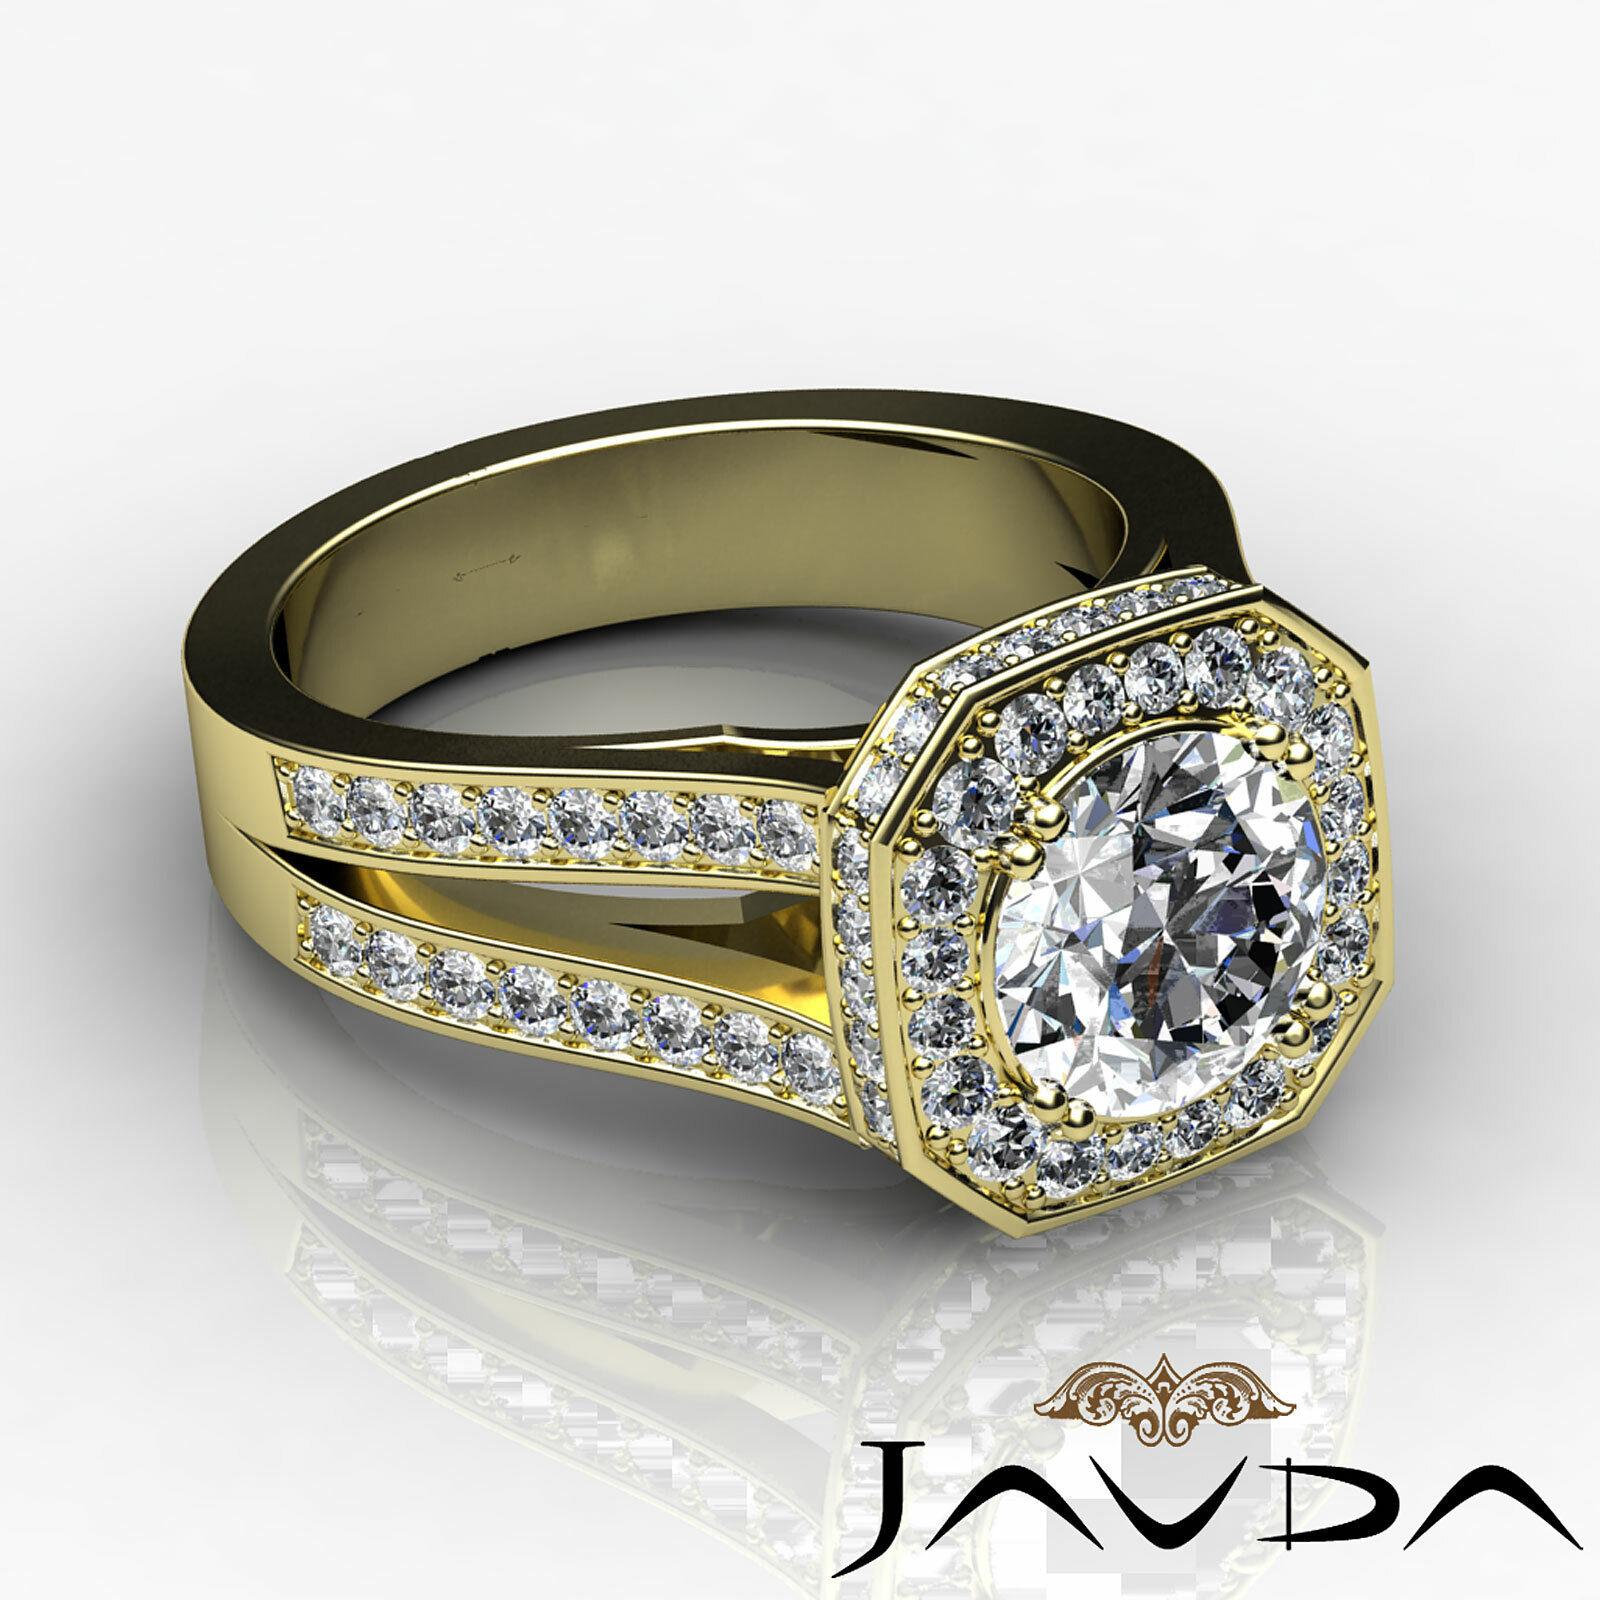 Hexagon Halo Split Shank Round Diamond Engagement Ring GIA F VS1 Clarity 2.84Ct 8